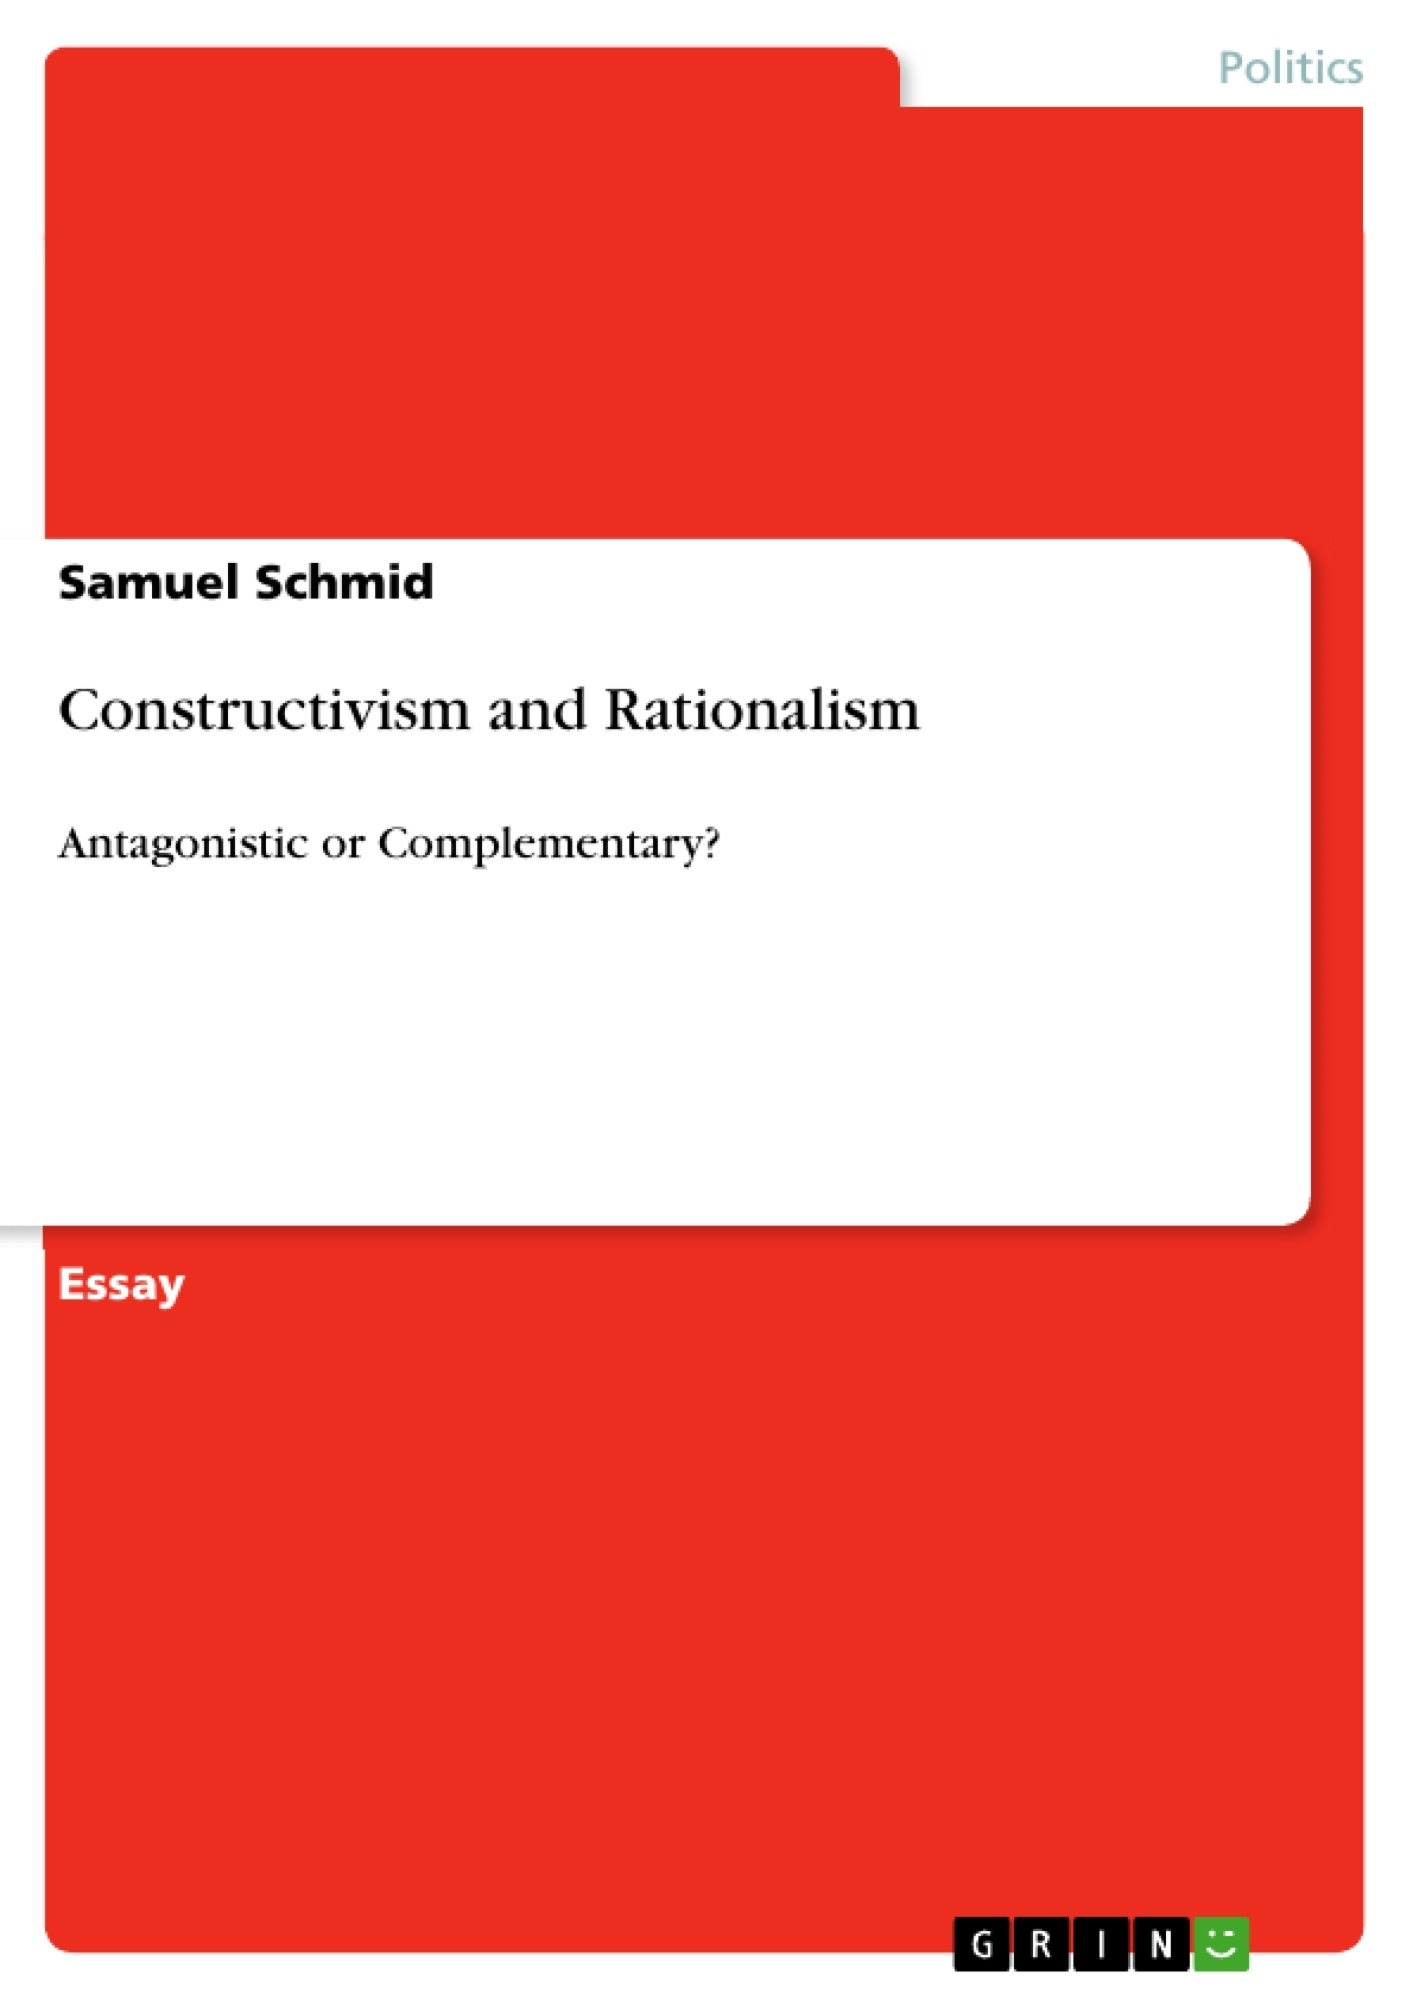 Title: Constructivism and Rationalism